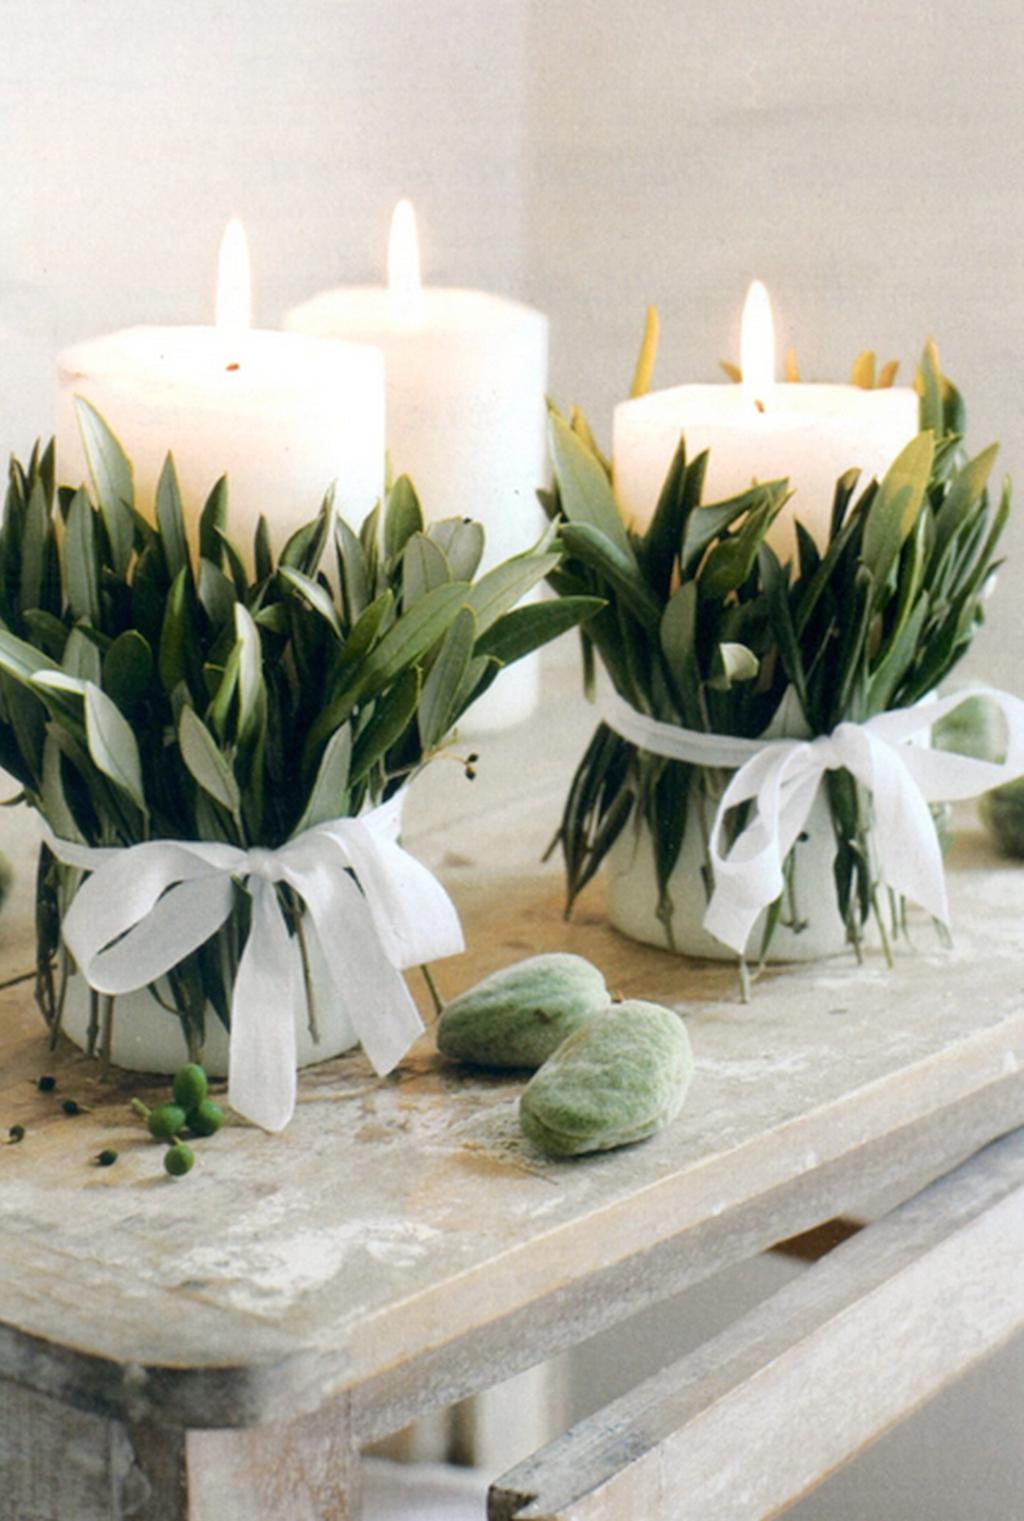 Wedding decorations for house january 2019  greenery wedding ideas   january    Pinterest